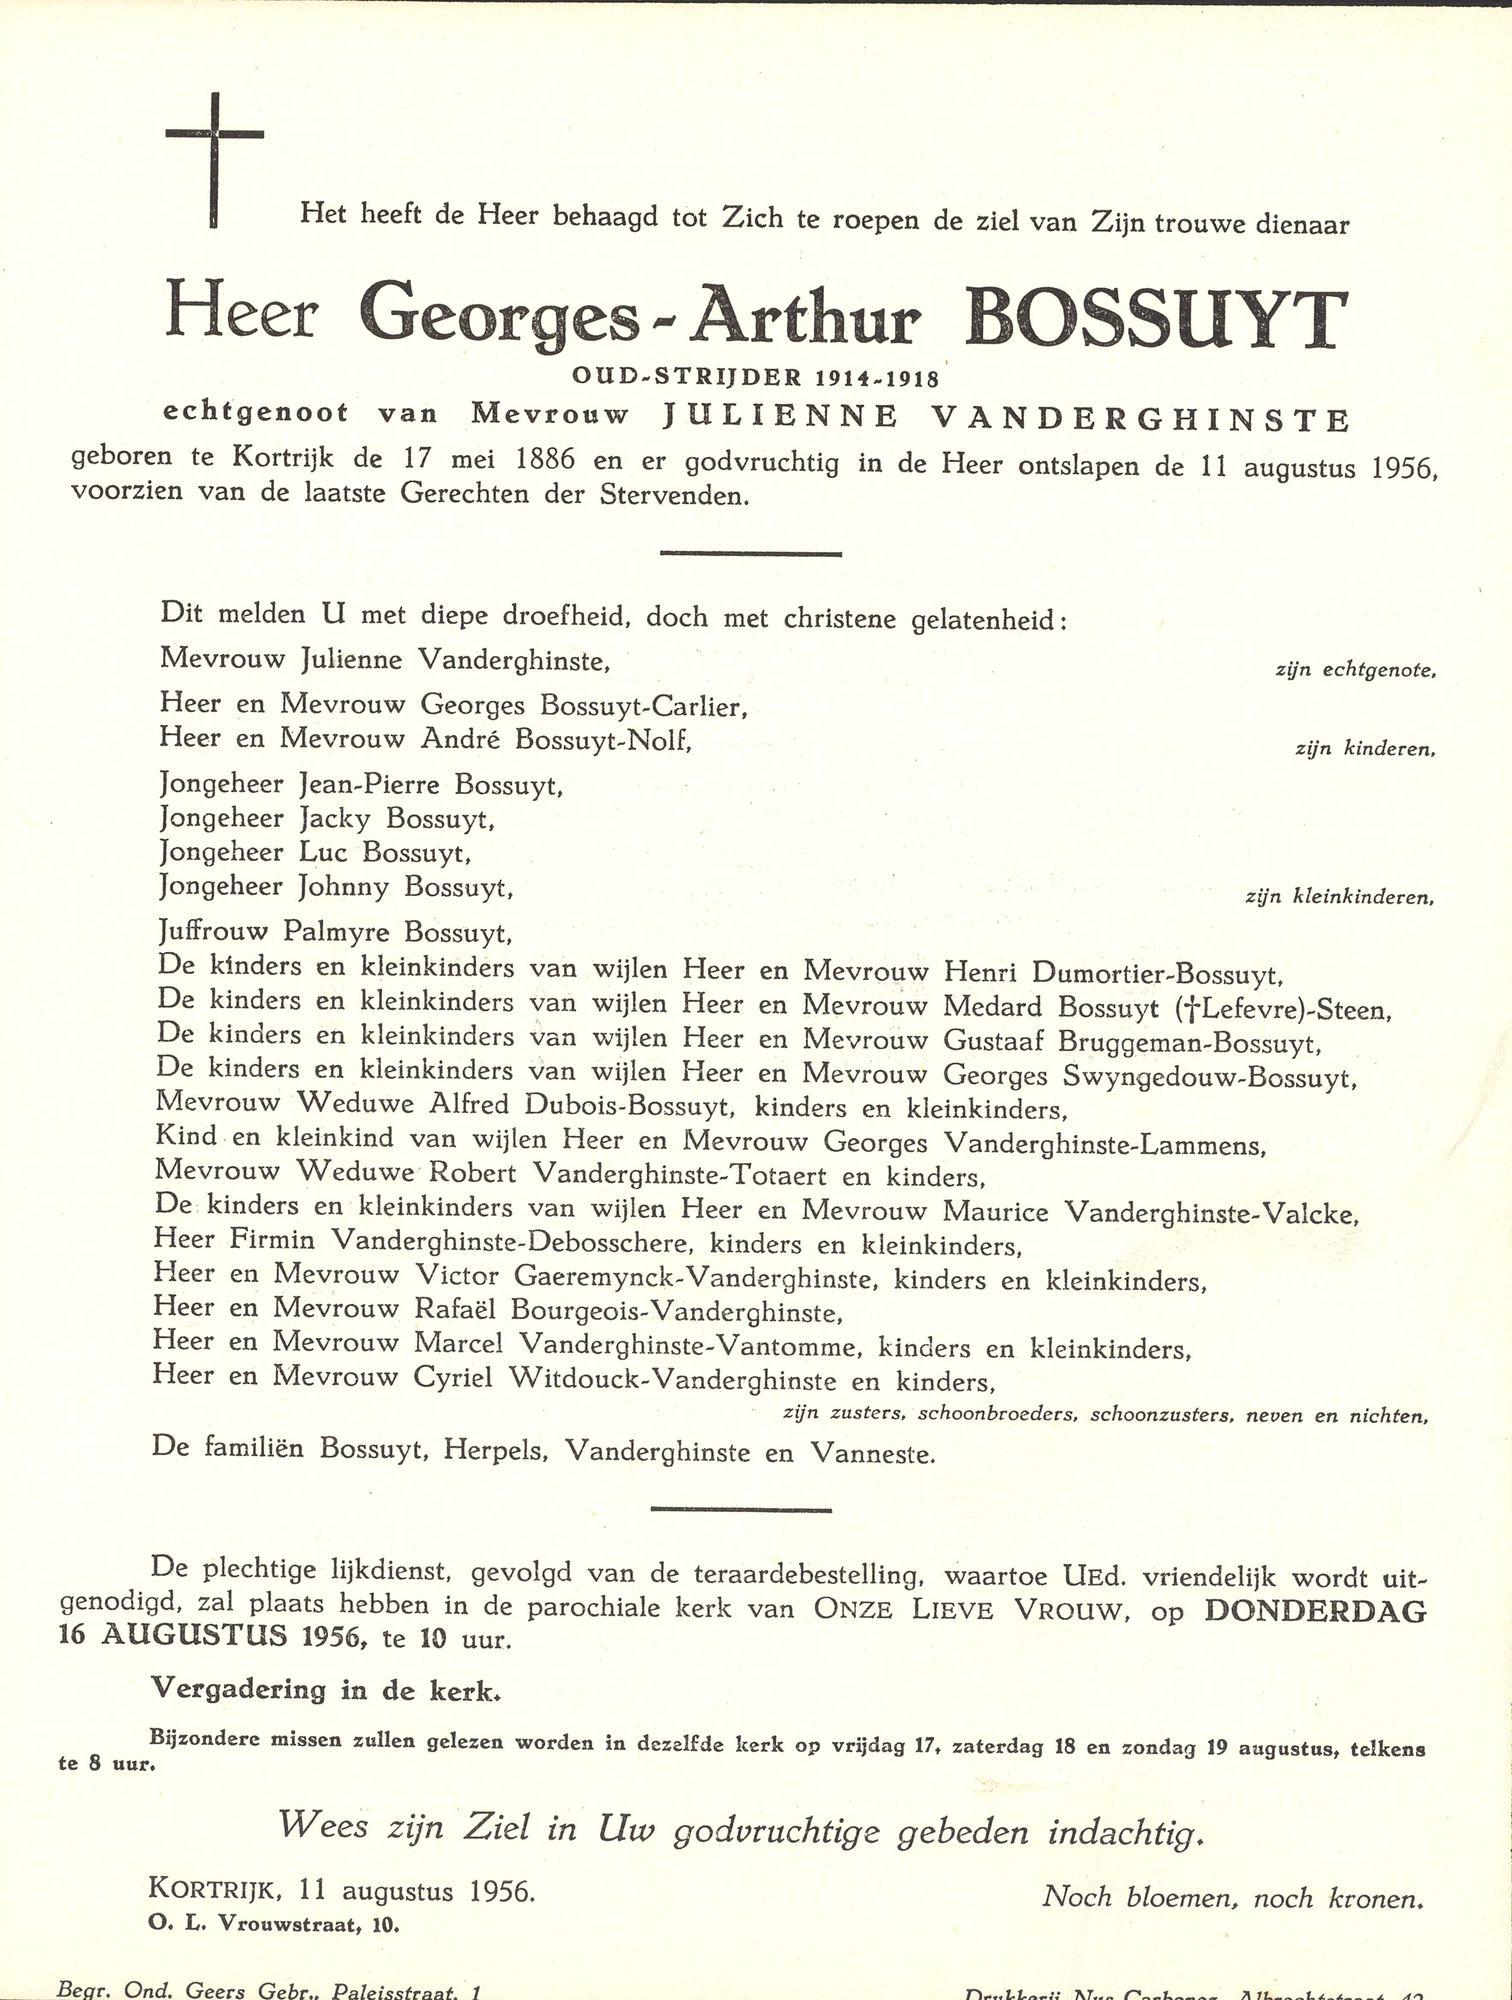 Bossuyt Georges-Arthur